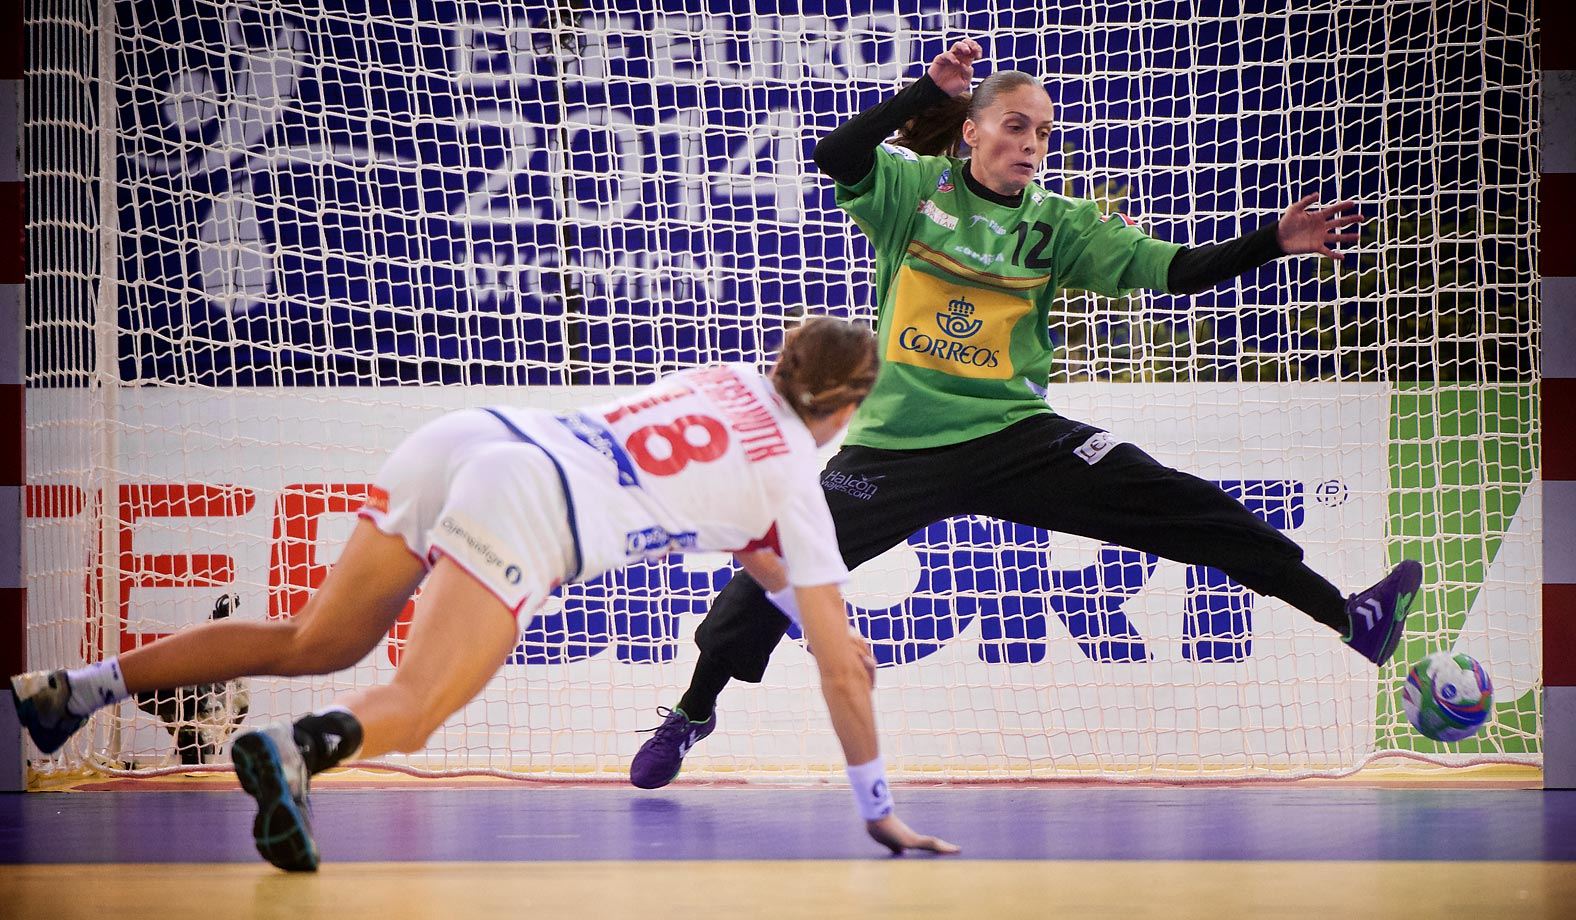 Norway's Linn-Kristin Riegelhuth Koren scores past Sweden goalkeeper Silvia Navarro during the championship game.